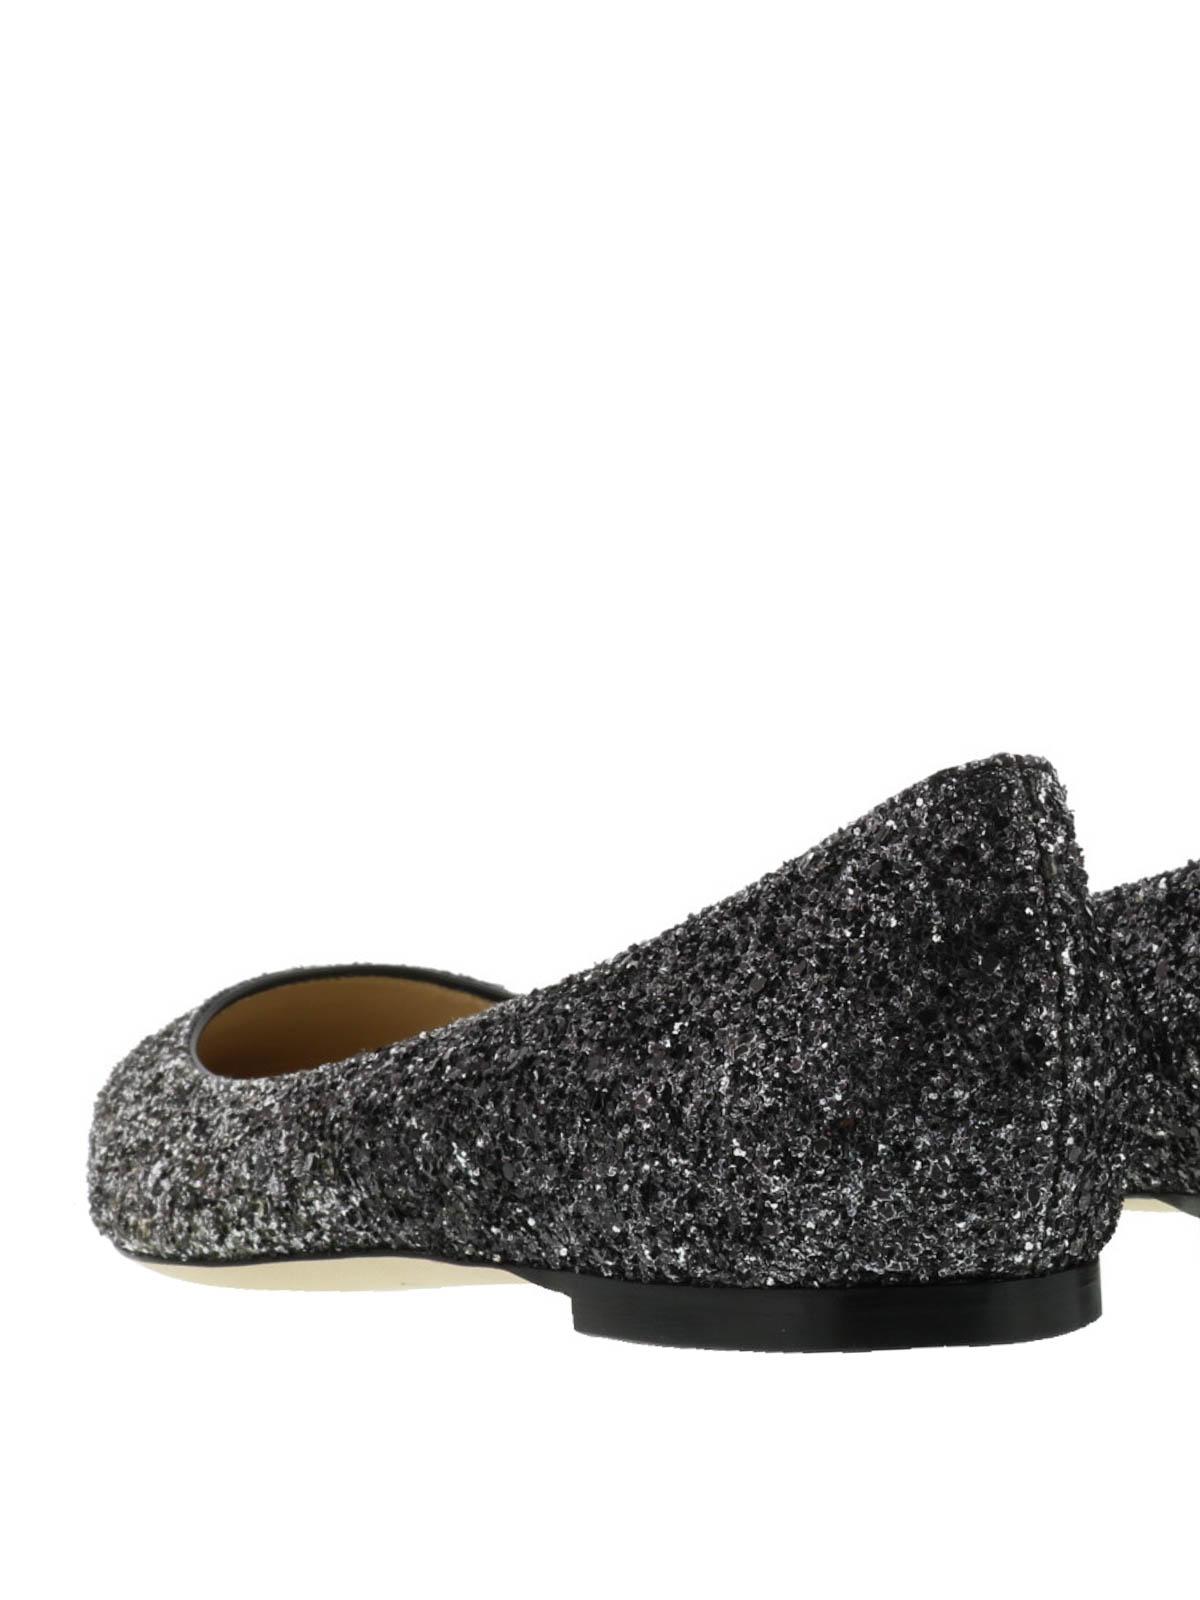 ebdc177b2639 Romy faded glitter ballerinas shop online  JIMMY CHOO · JIMMY CHOO  flat  shoes ...